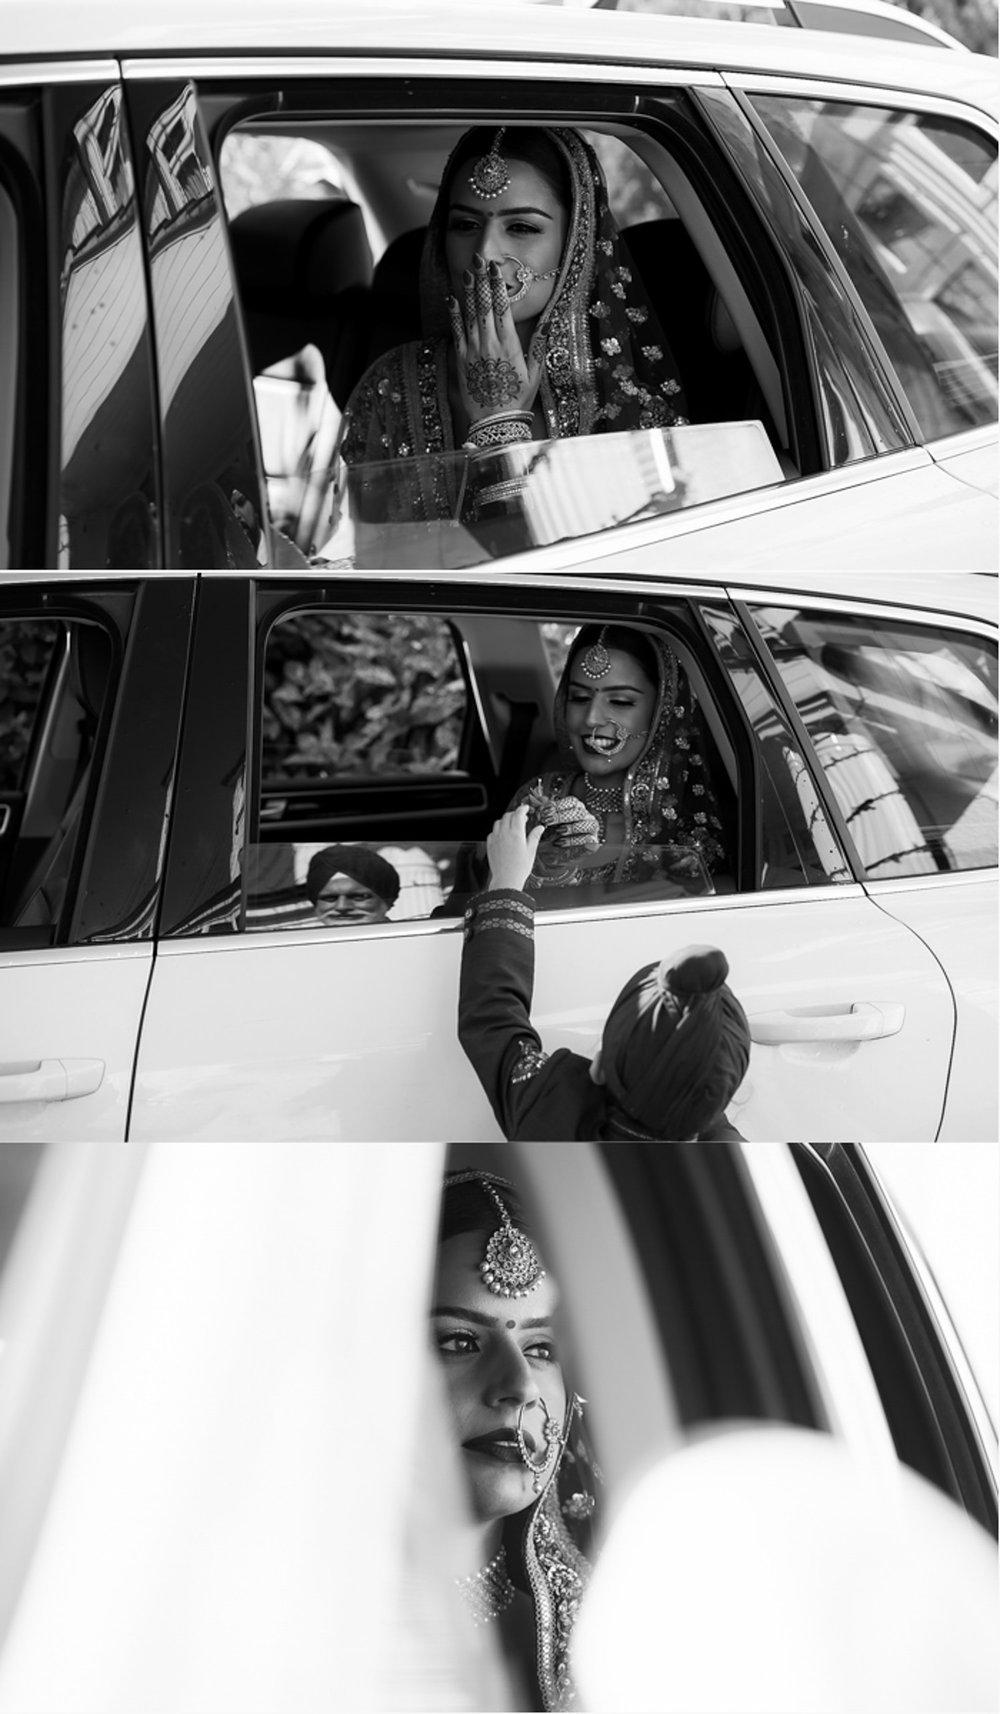 Indian bride in car saying farewells in morning